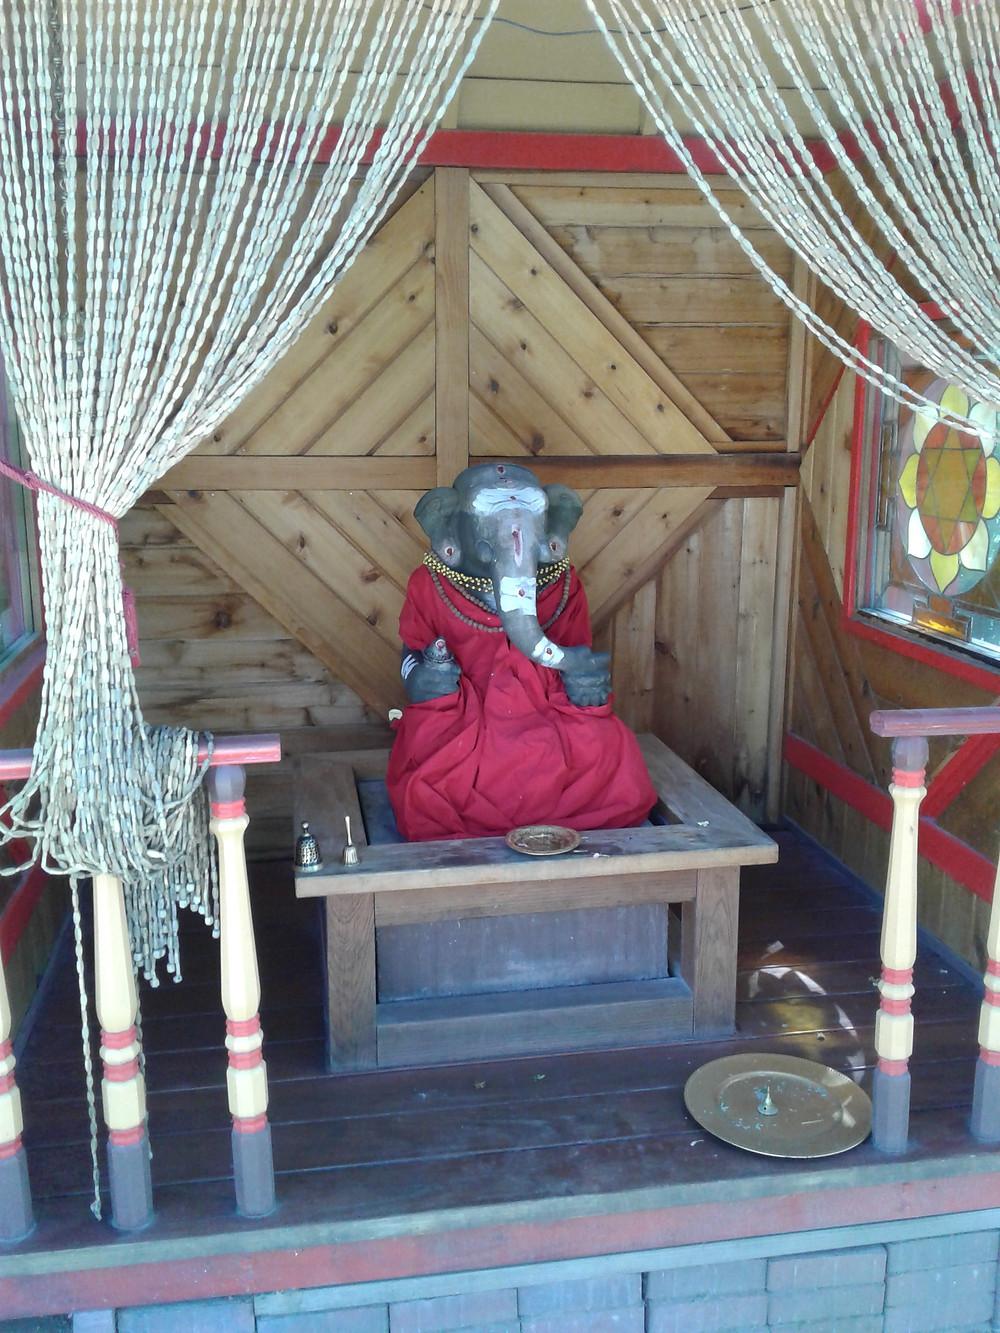 ~Lord Ganesha welcoming visitors to the Farm/Ashram~